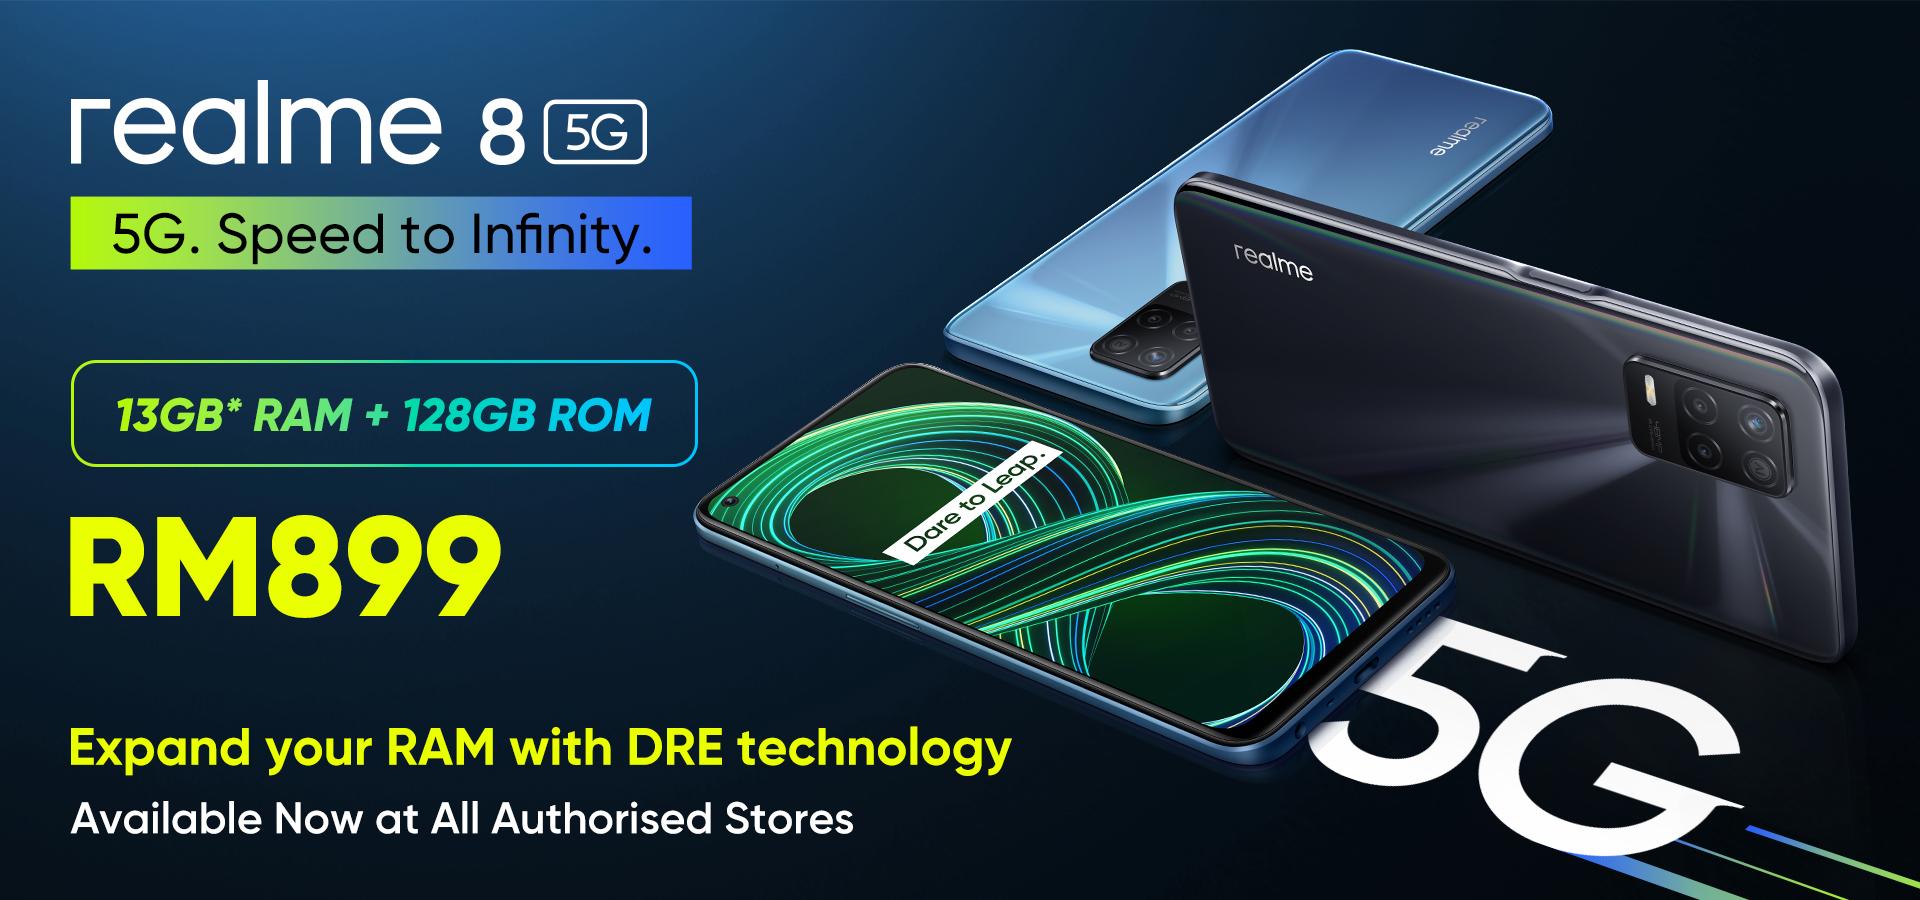 realme 8 5G 搭载DRE动态内存拓展技术,如今可以在Celcom签购并获取免费手机! 9